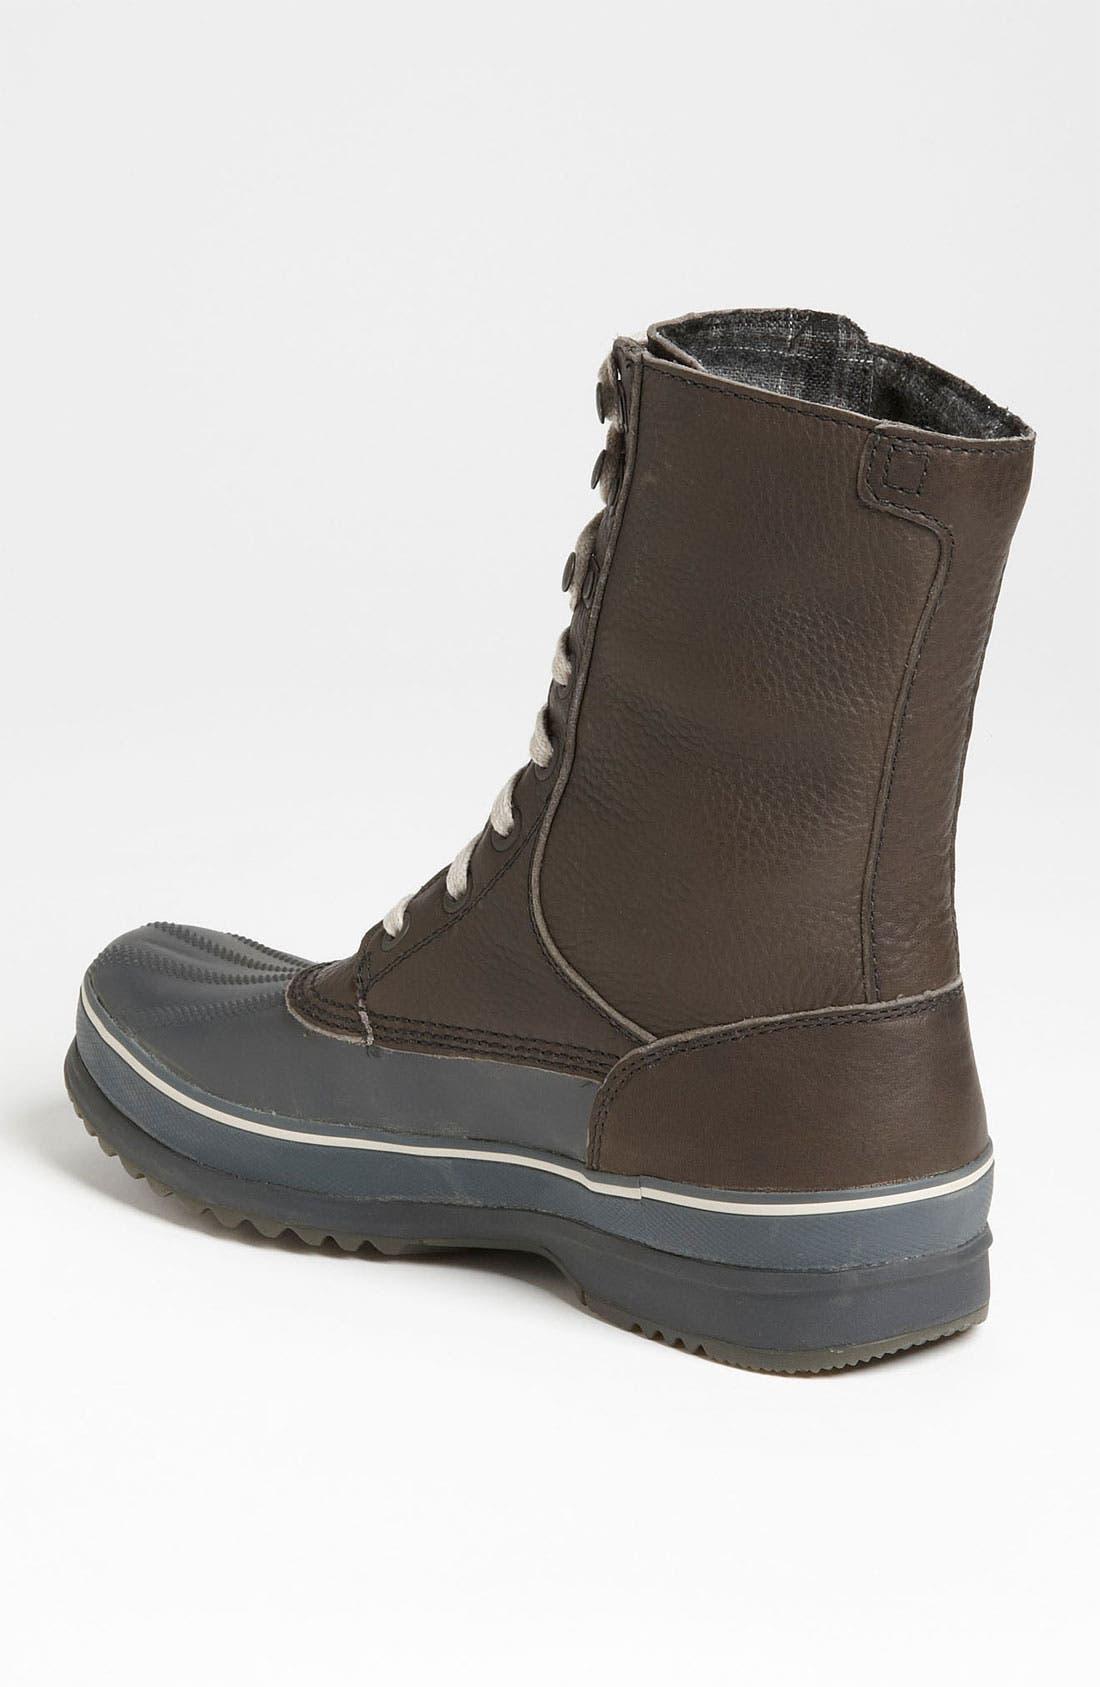 Alternate Image 2  - Sorel 'Kitchener Frost' Snow Boot (Online Only)